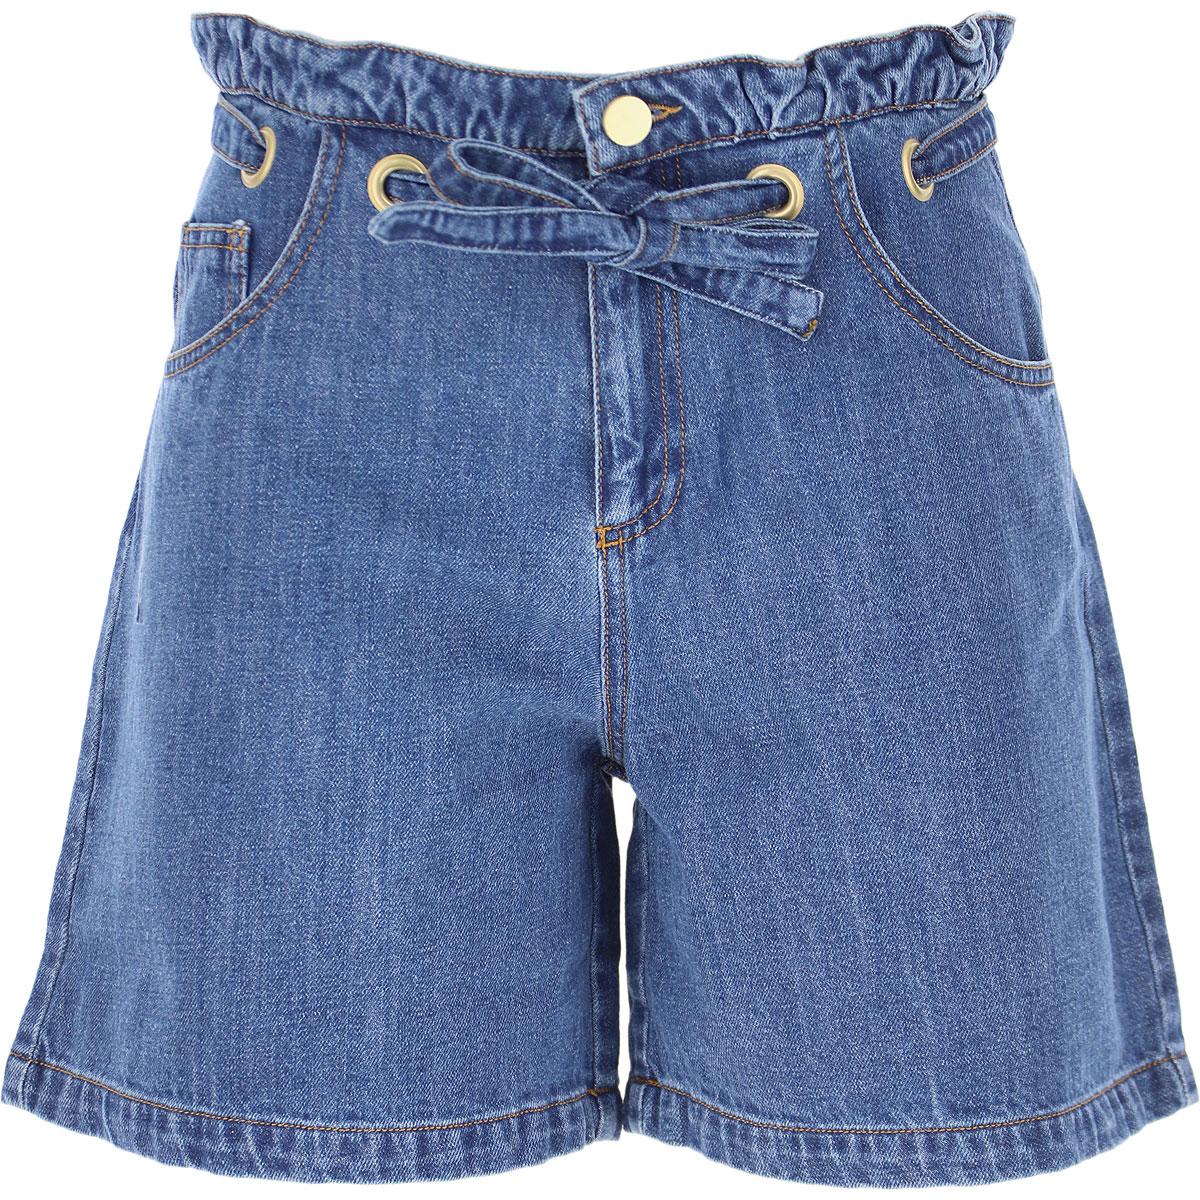 Philosophy di Lorenzo Serafini Kids Shorts for Girls On Sale, Blue Denim, Cotton, 2019, 10Y 12Y